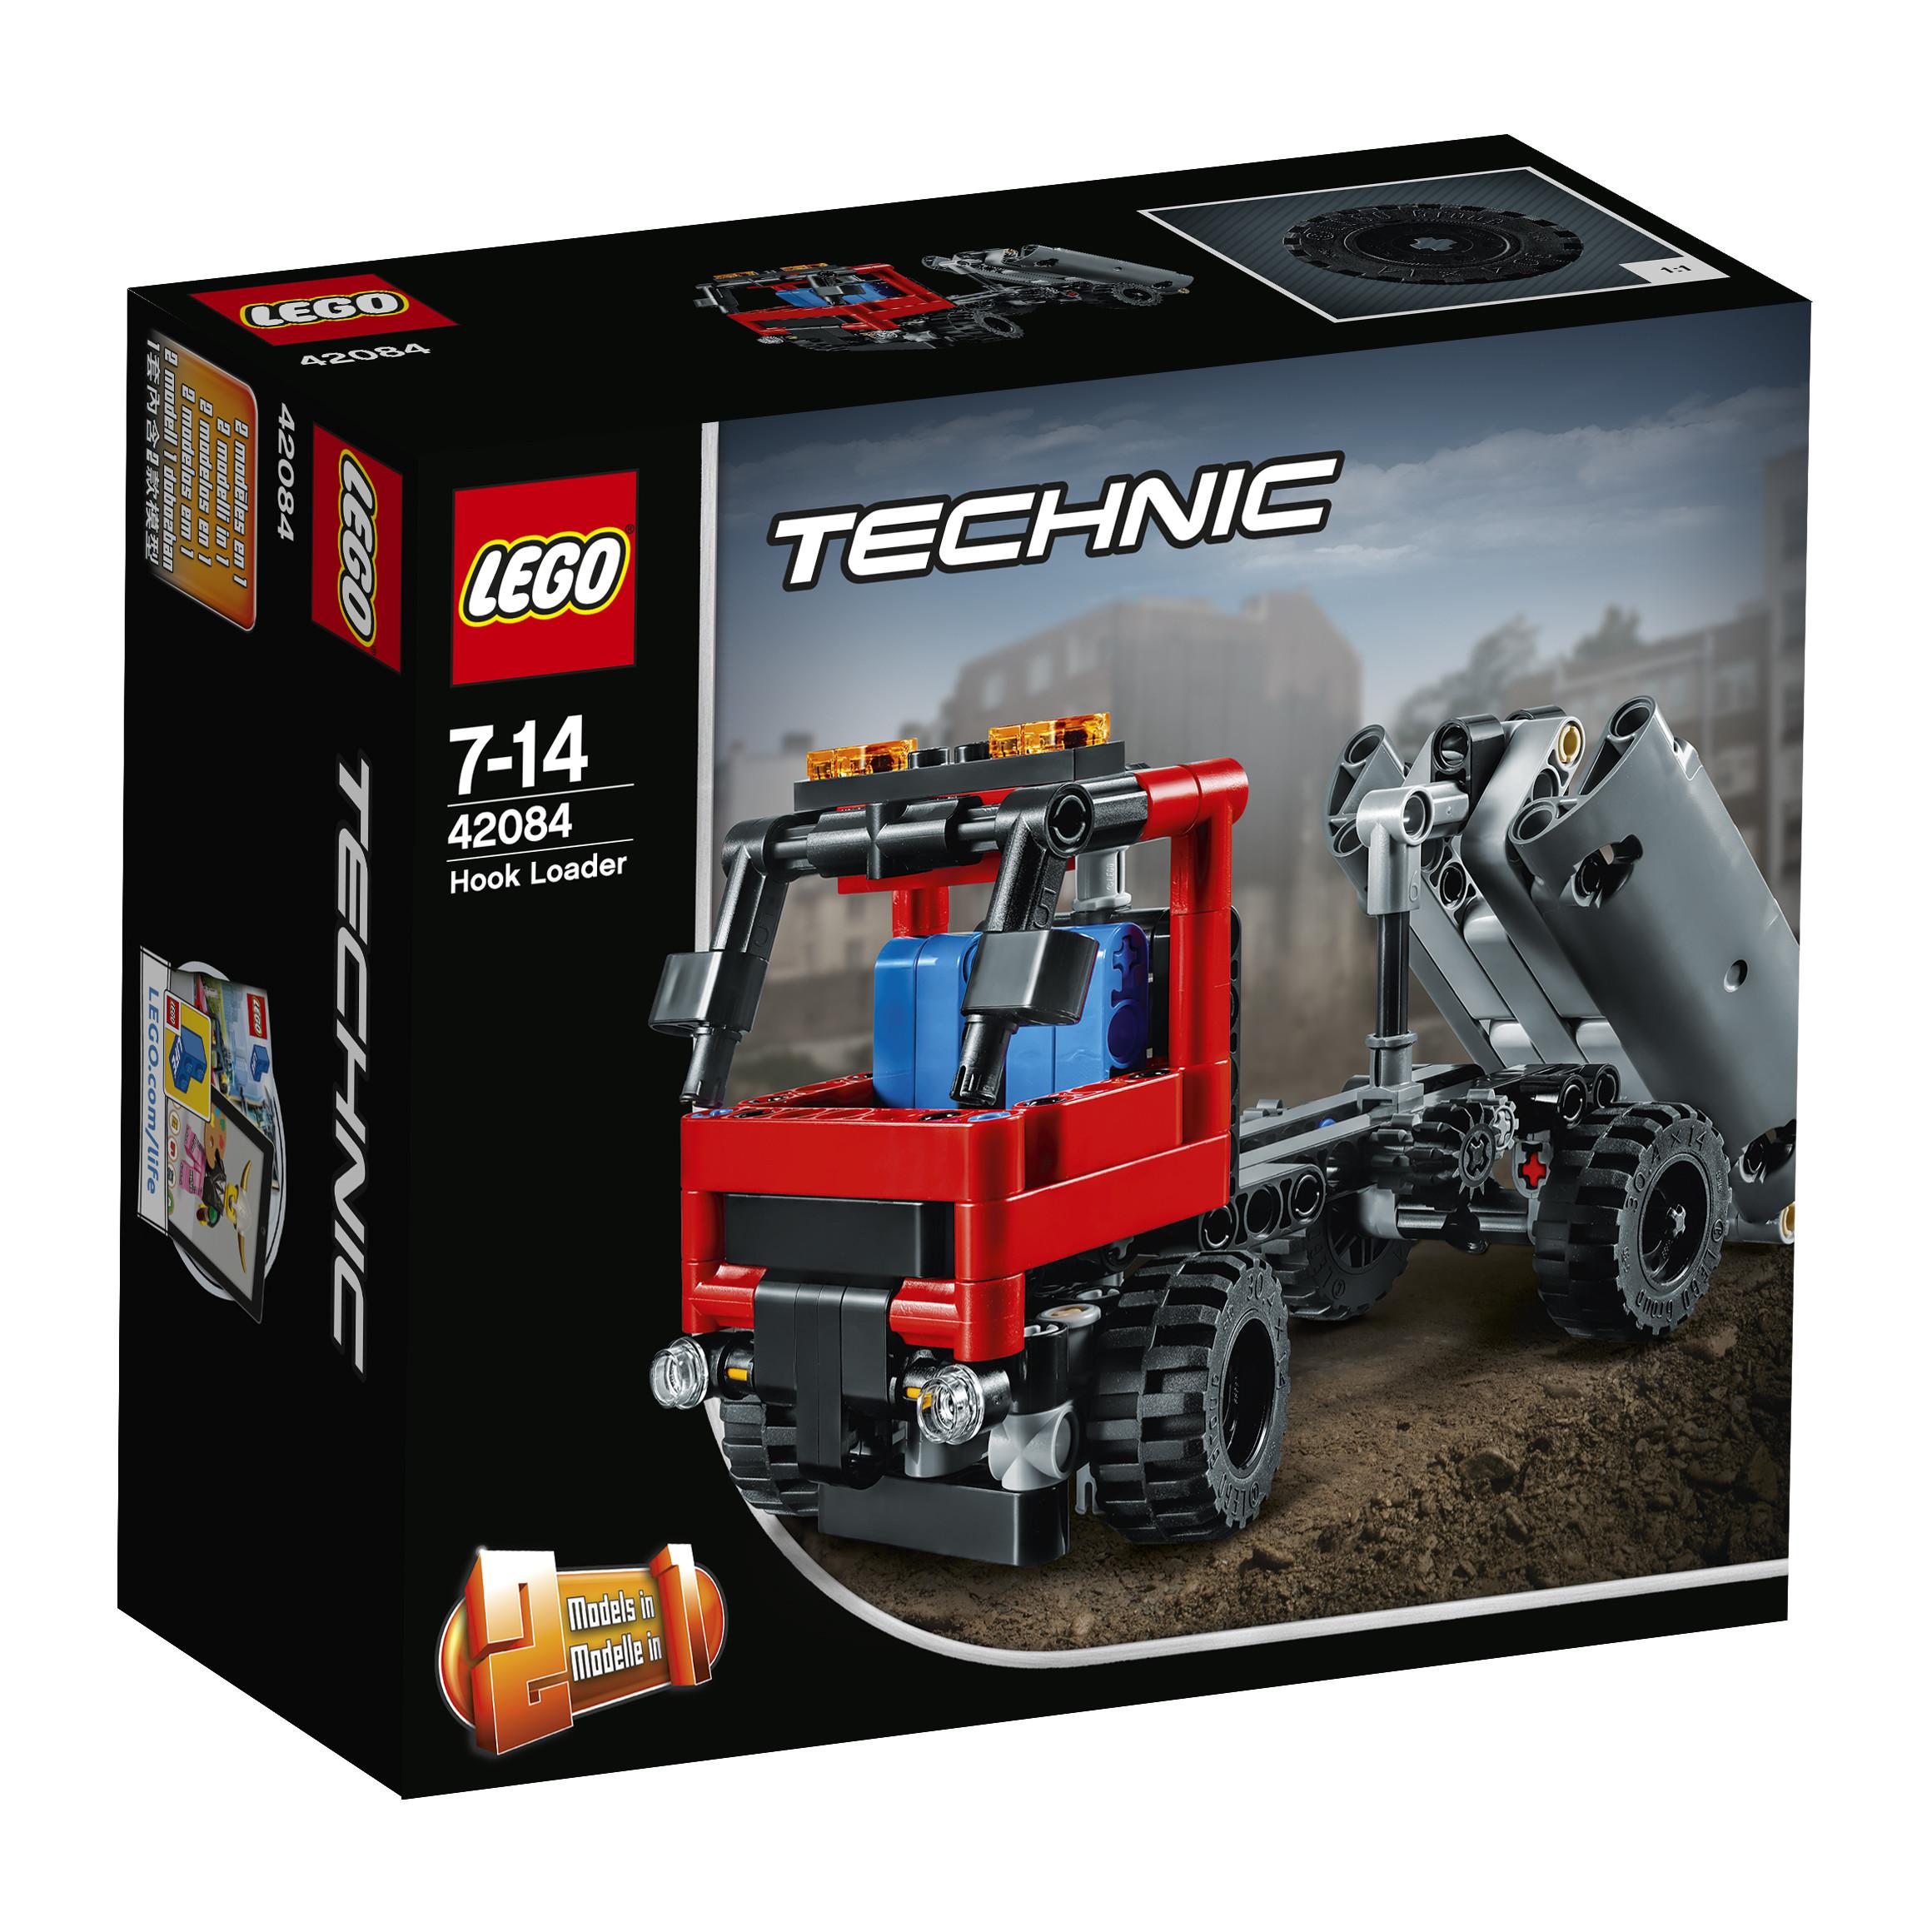 LEGO LEGO Конструктор LEGO Technic 42084 Погрузчик конструктор lego technic бульдозер 42071